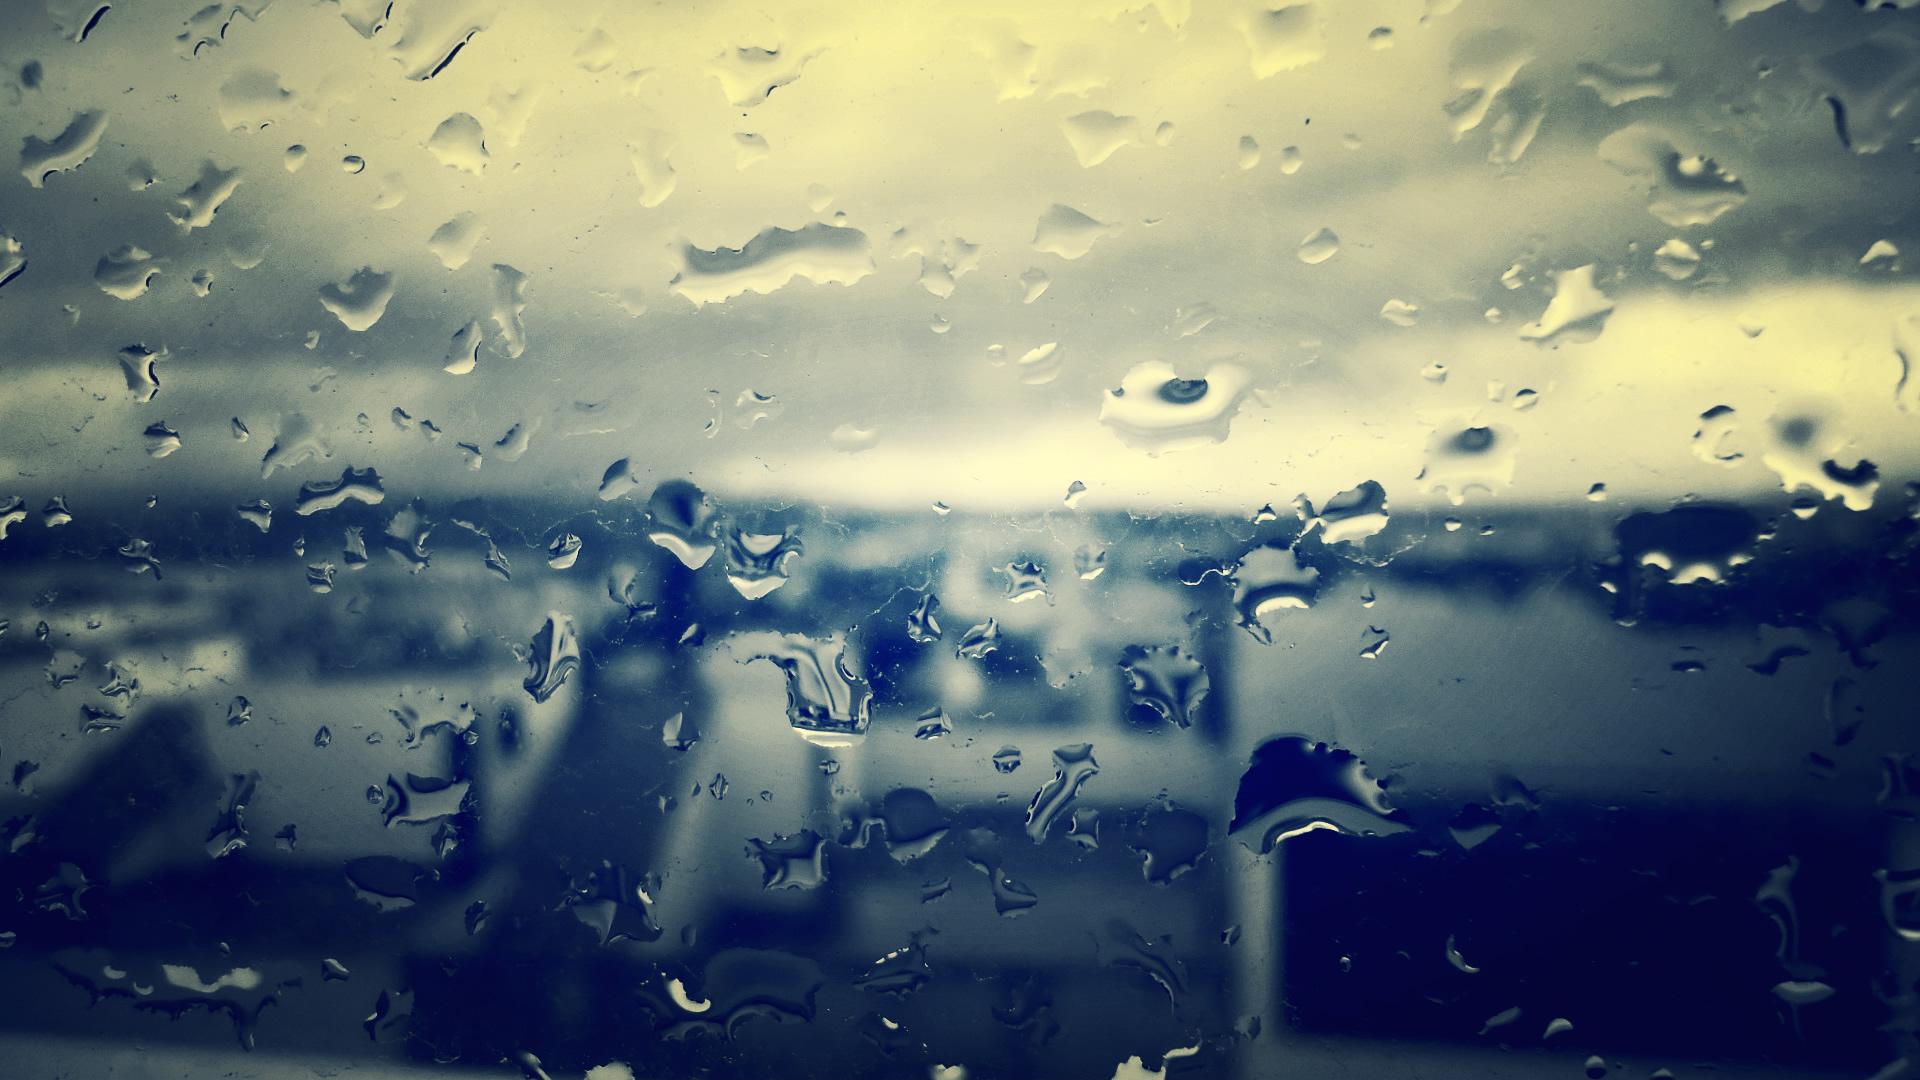 Rainy Day Wallpaper HD - WallpaperSafari